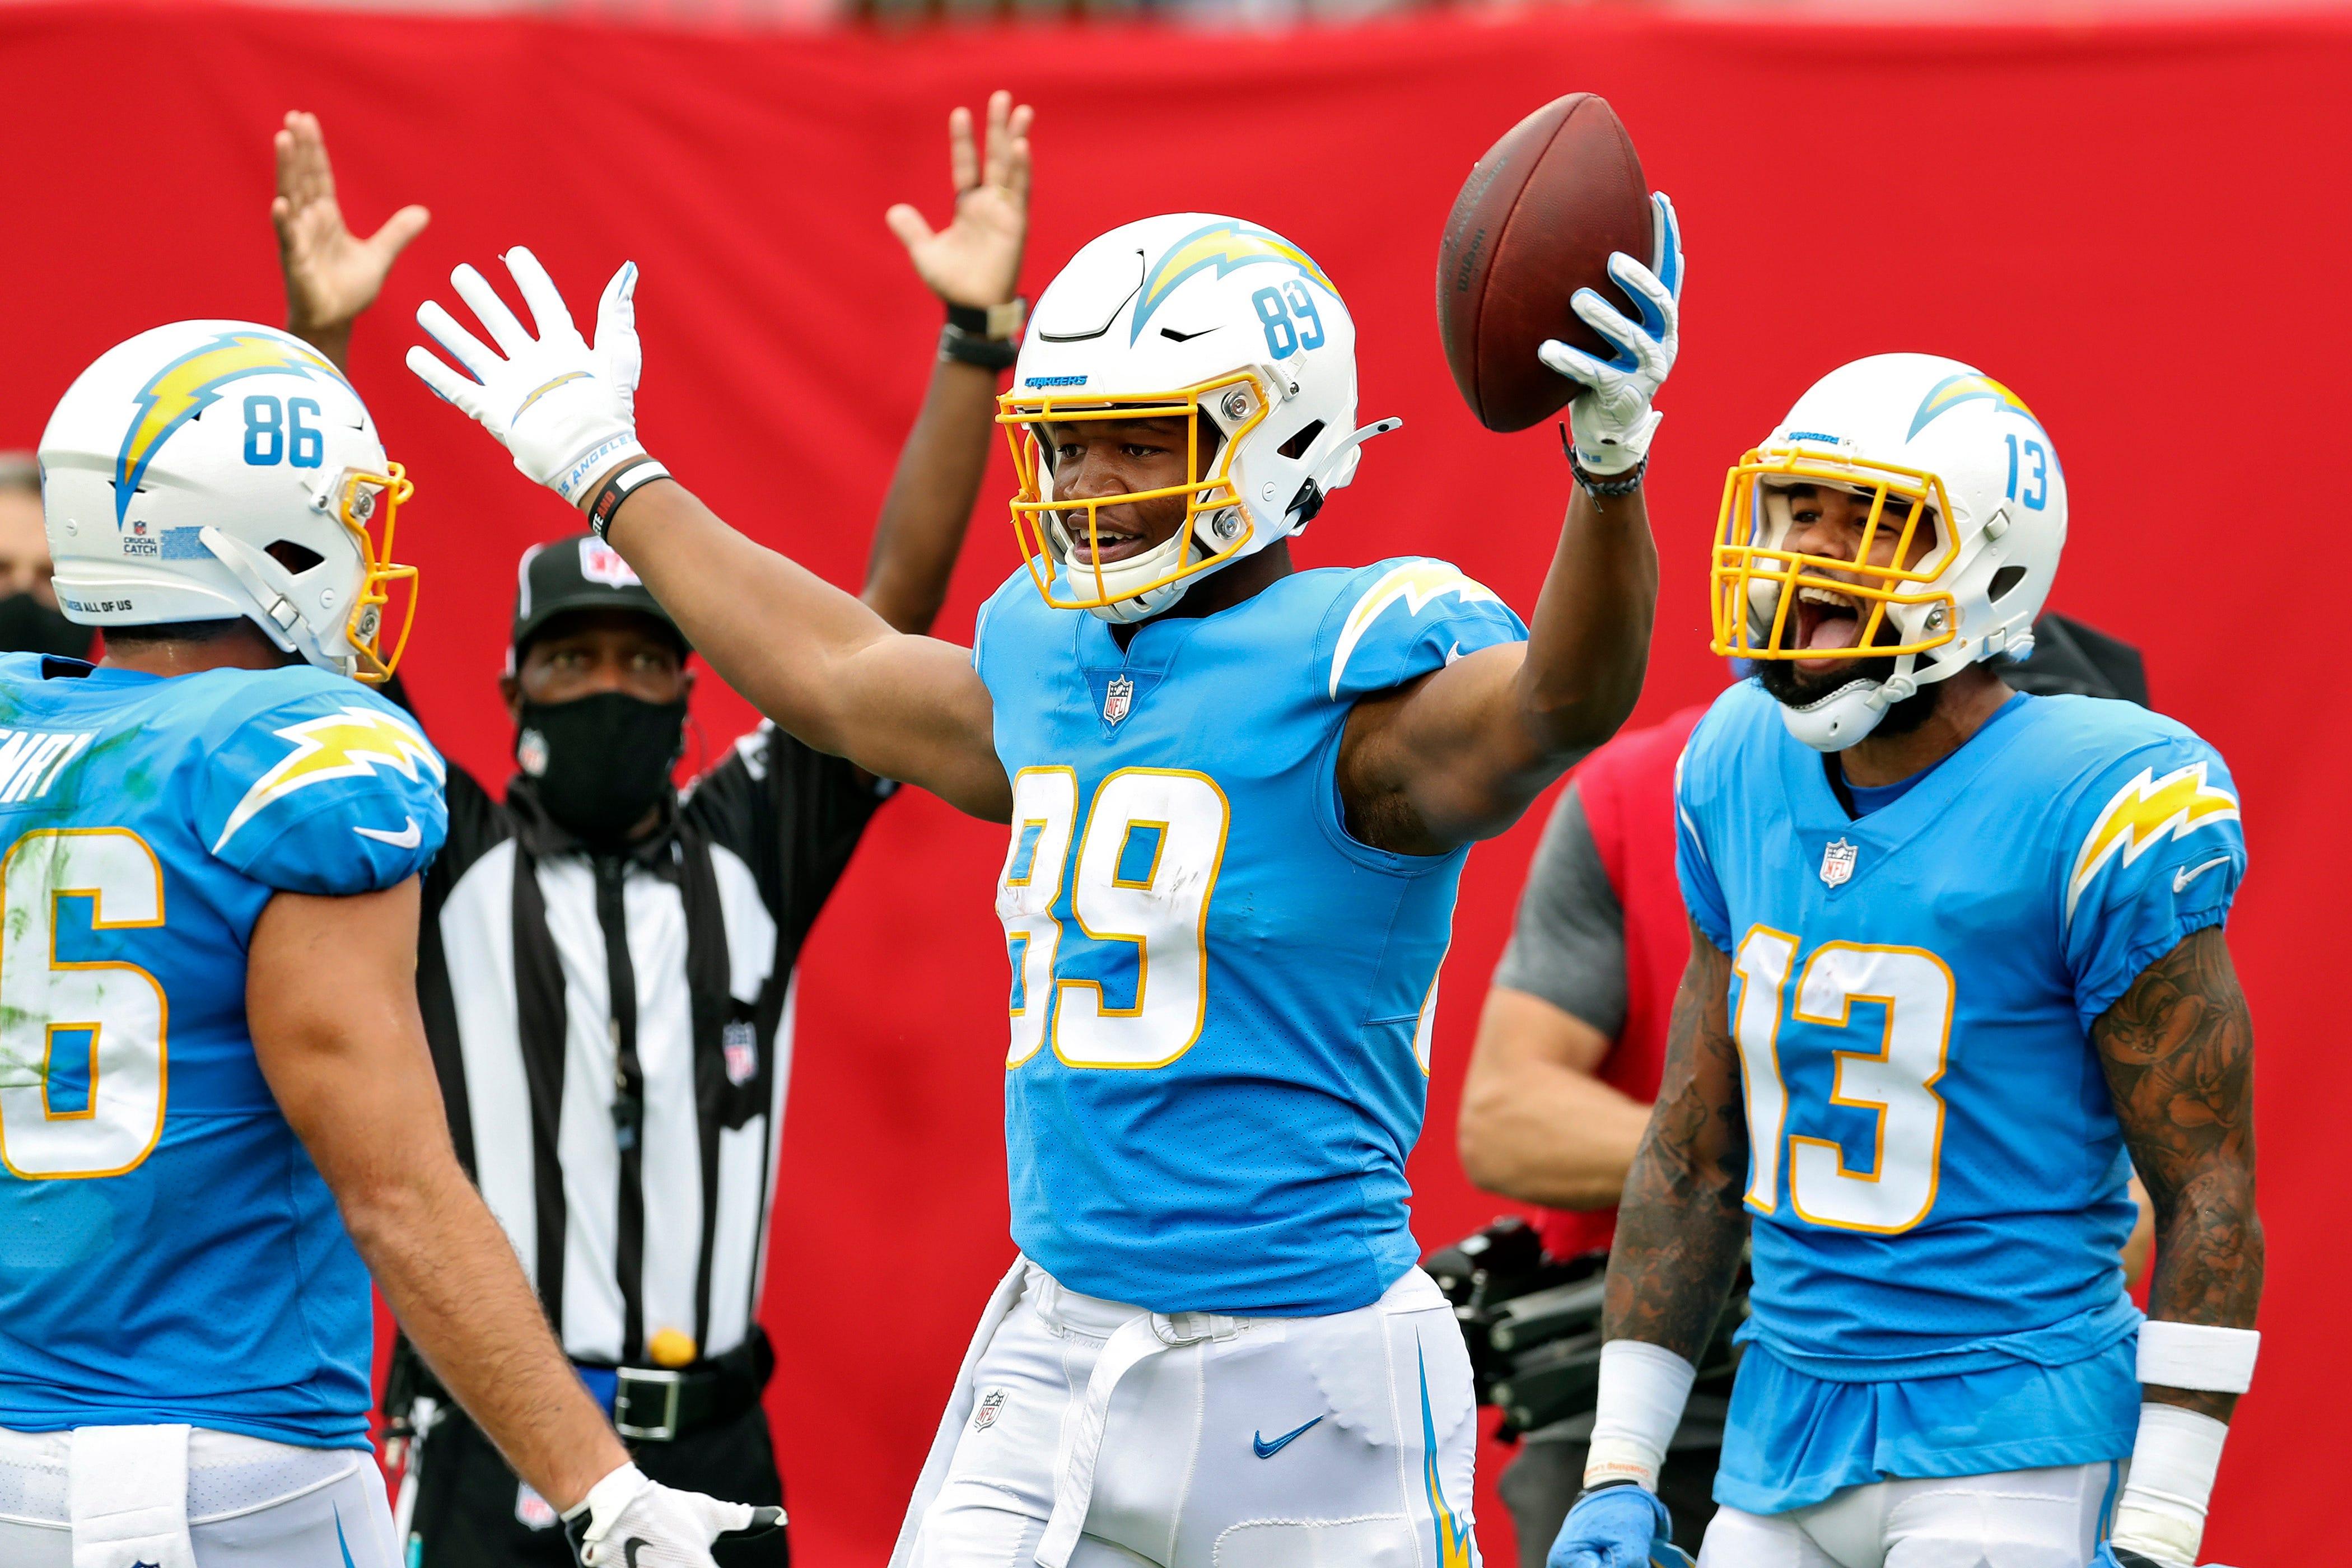 NFL Preseason Week 2 Picks Against the Spread for Sunday